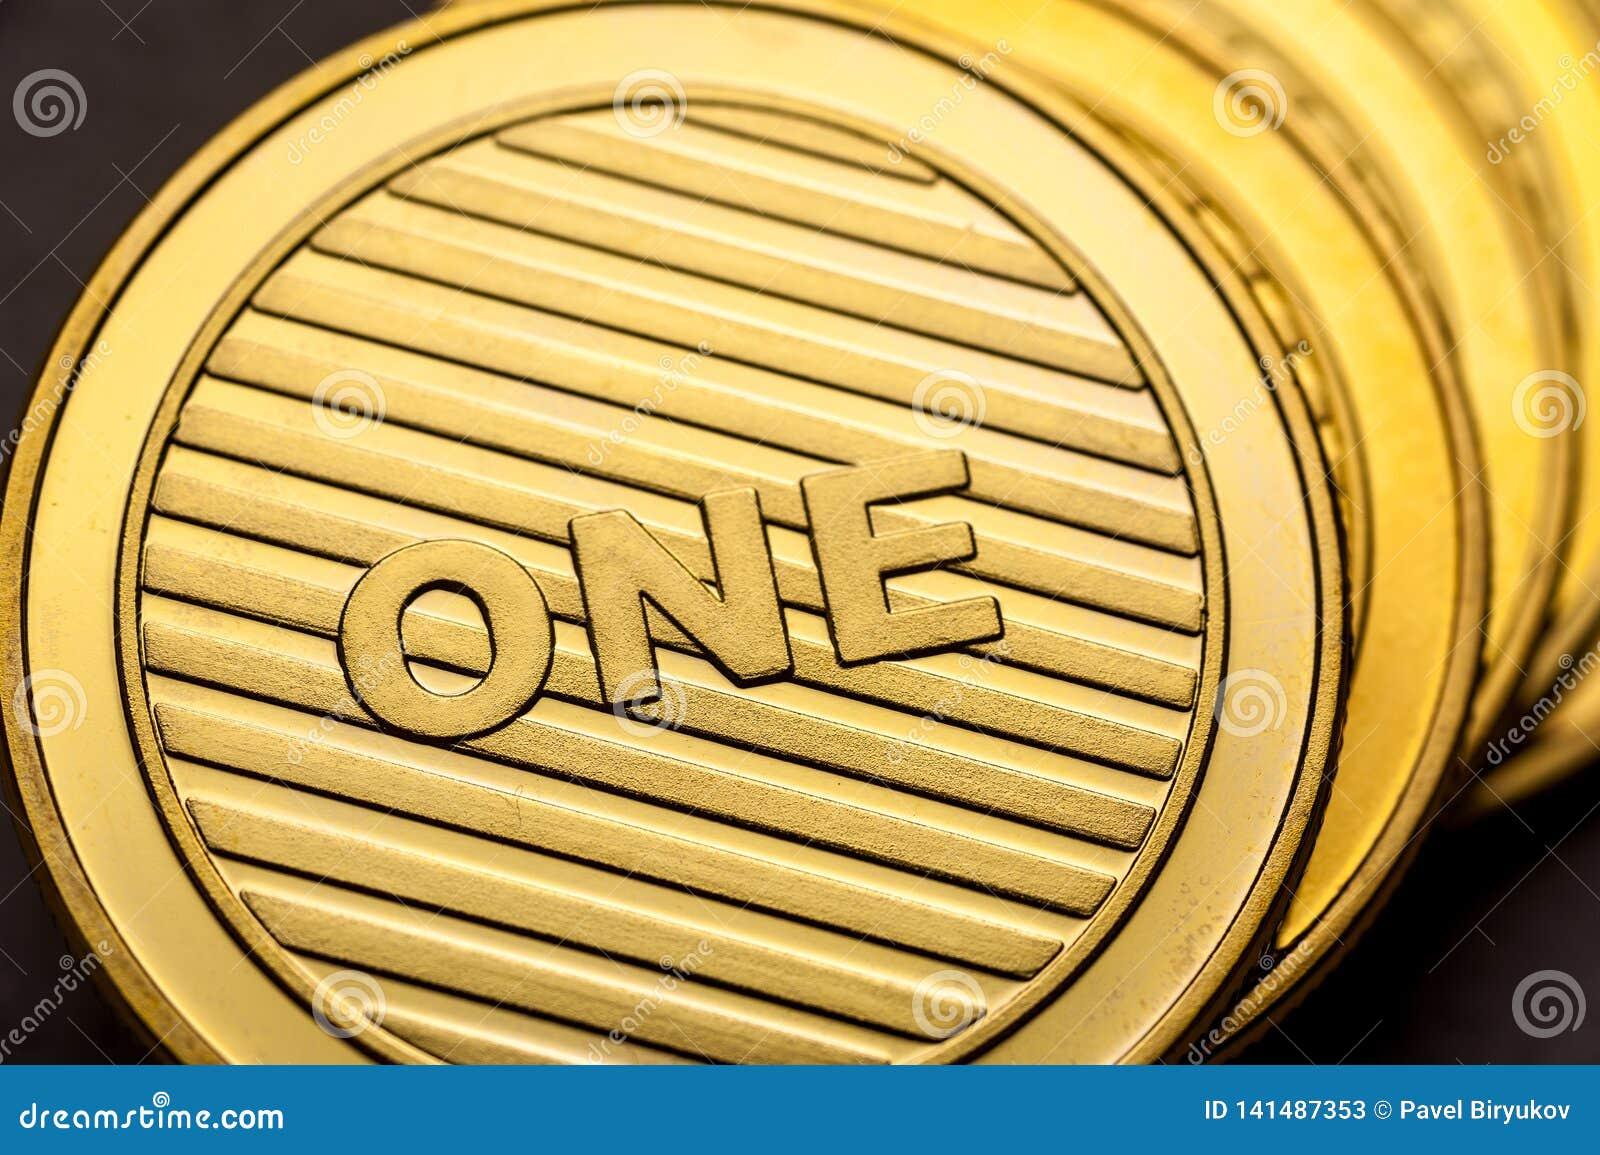 Cryptocurrency, blockchain technologia, handel elektroniczny